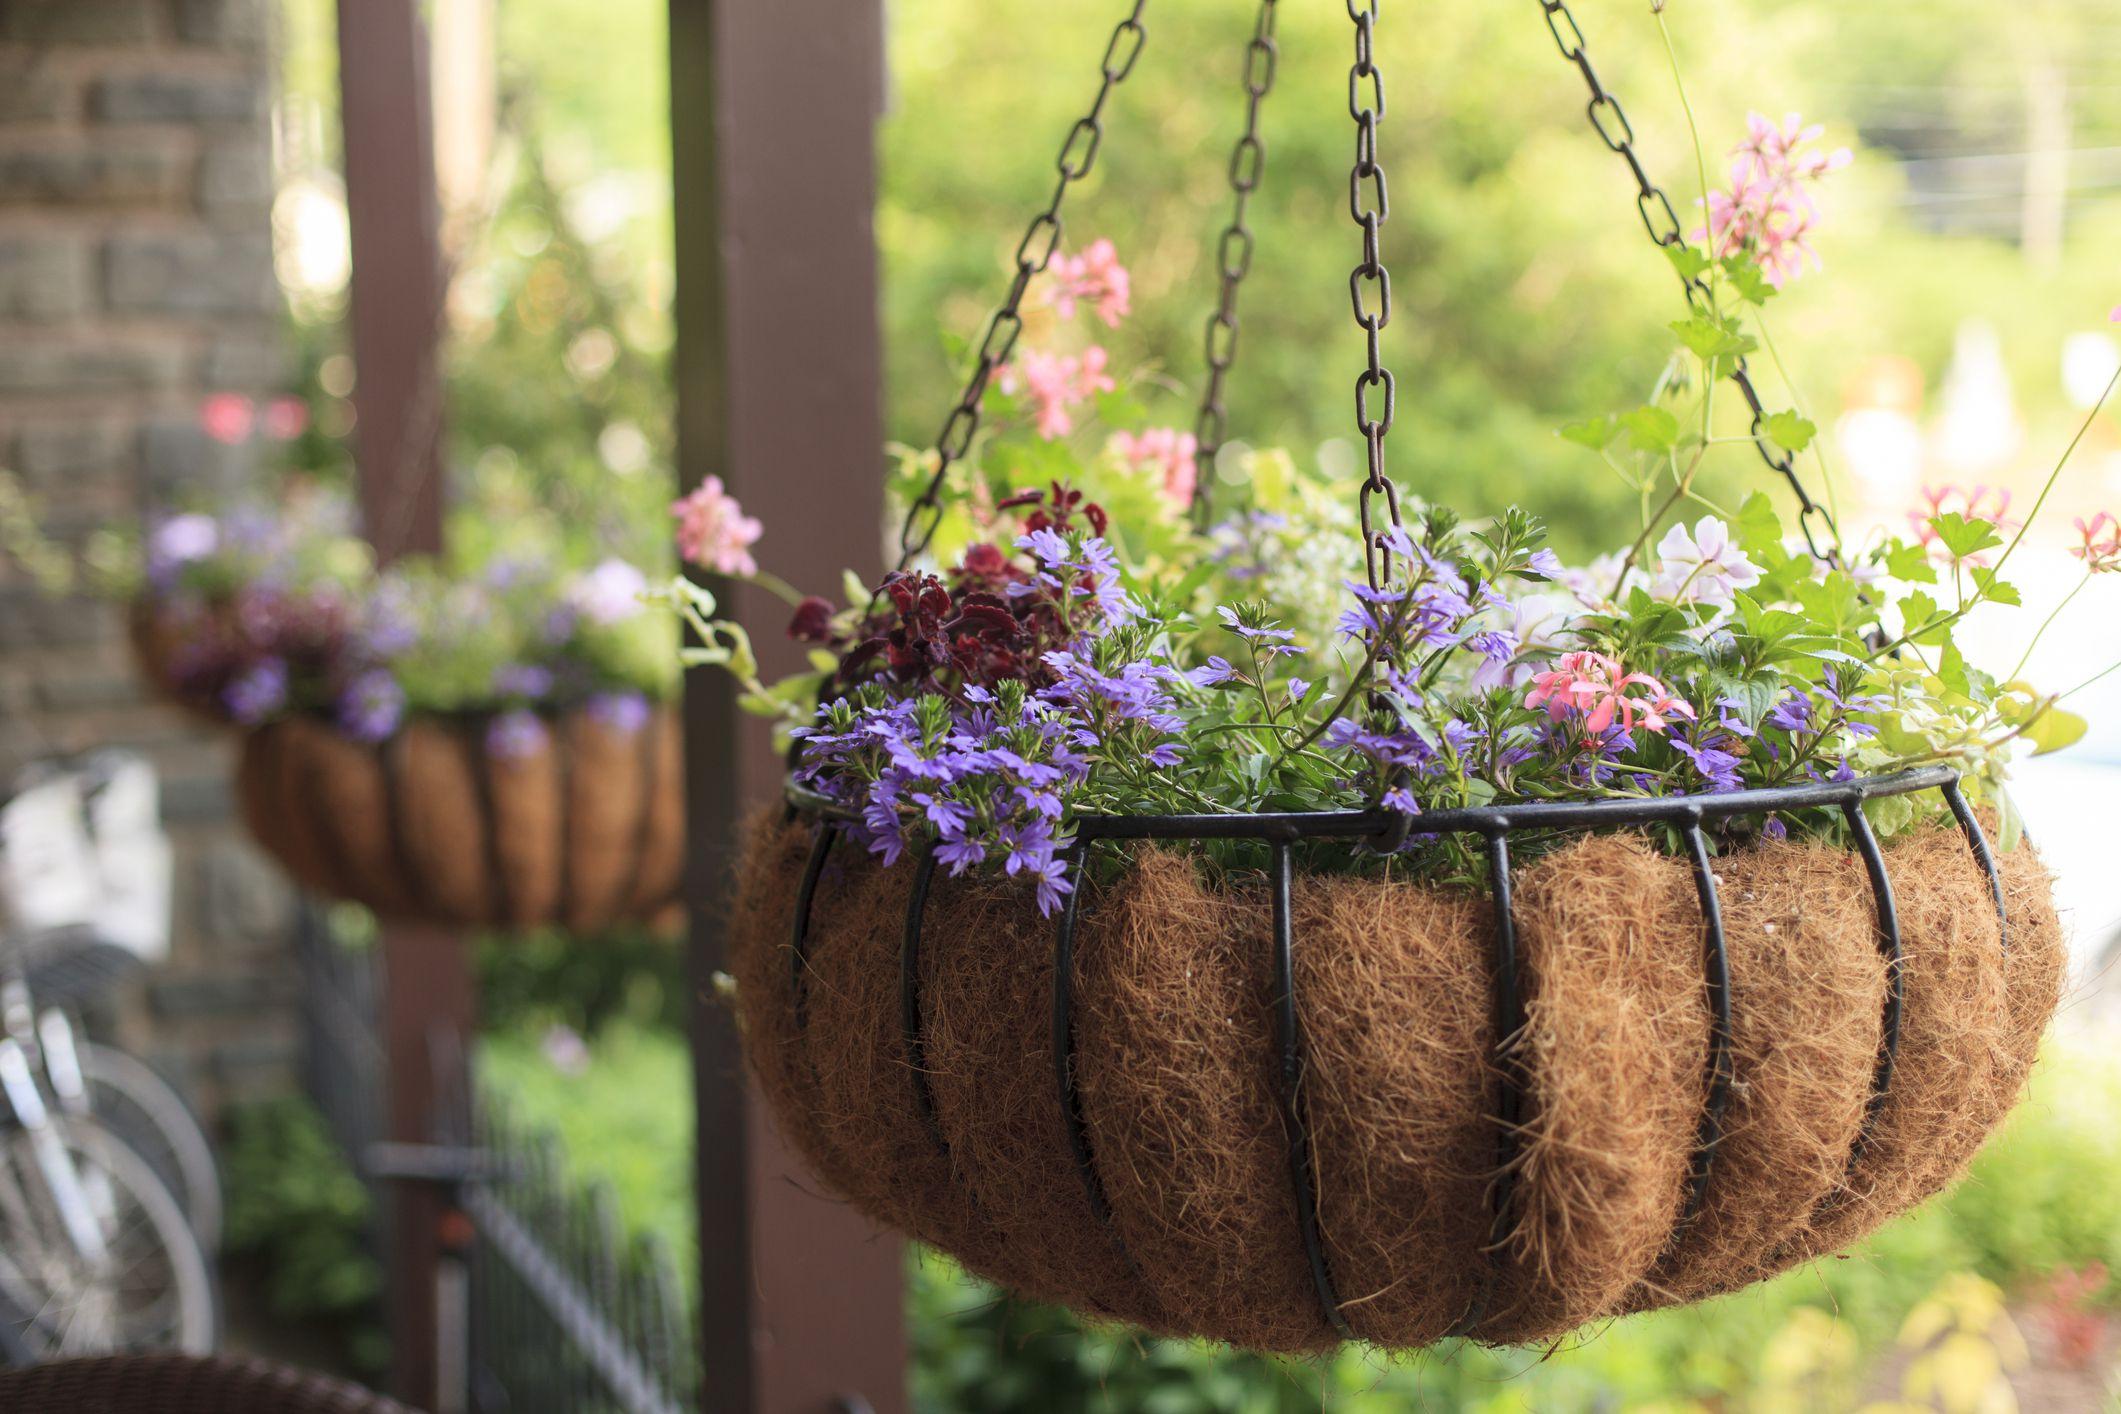 Small Hanging Basket Flowers: Plant A Flowering Hanging Basket